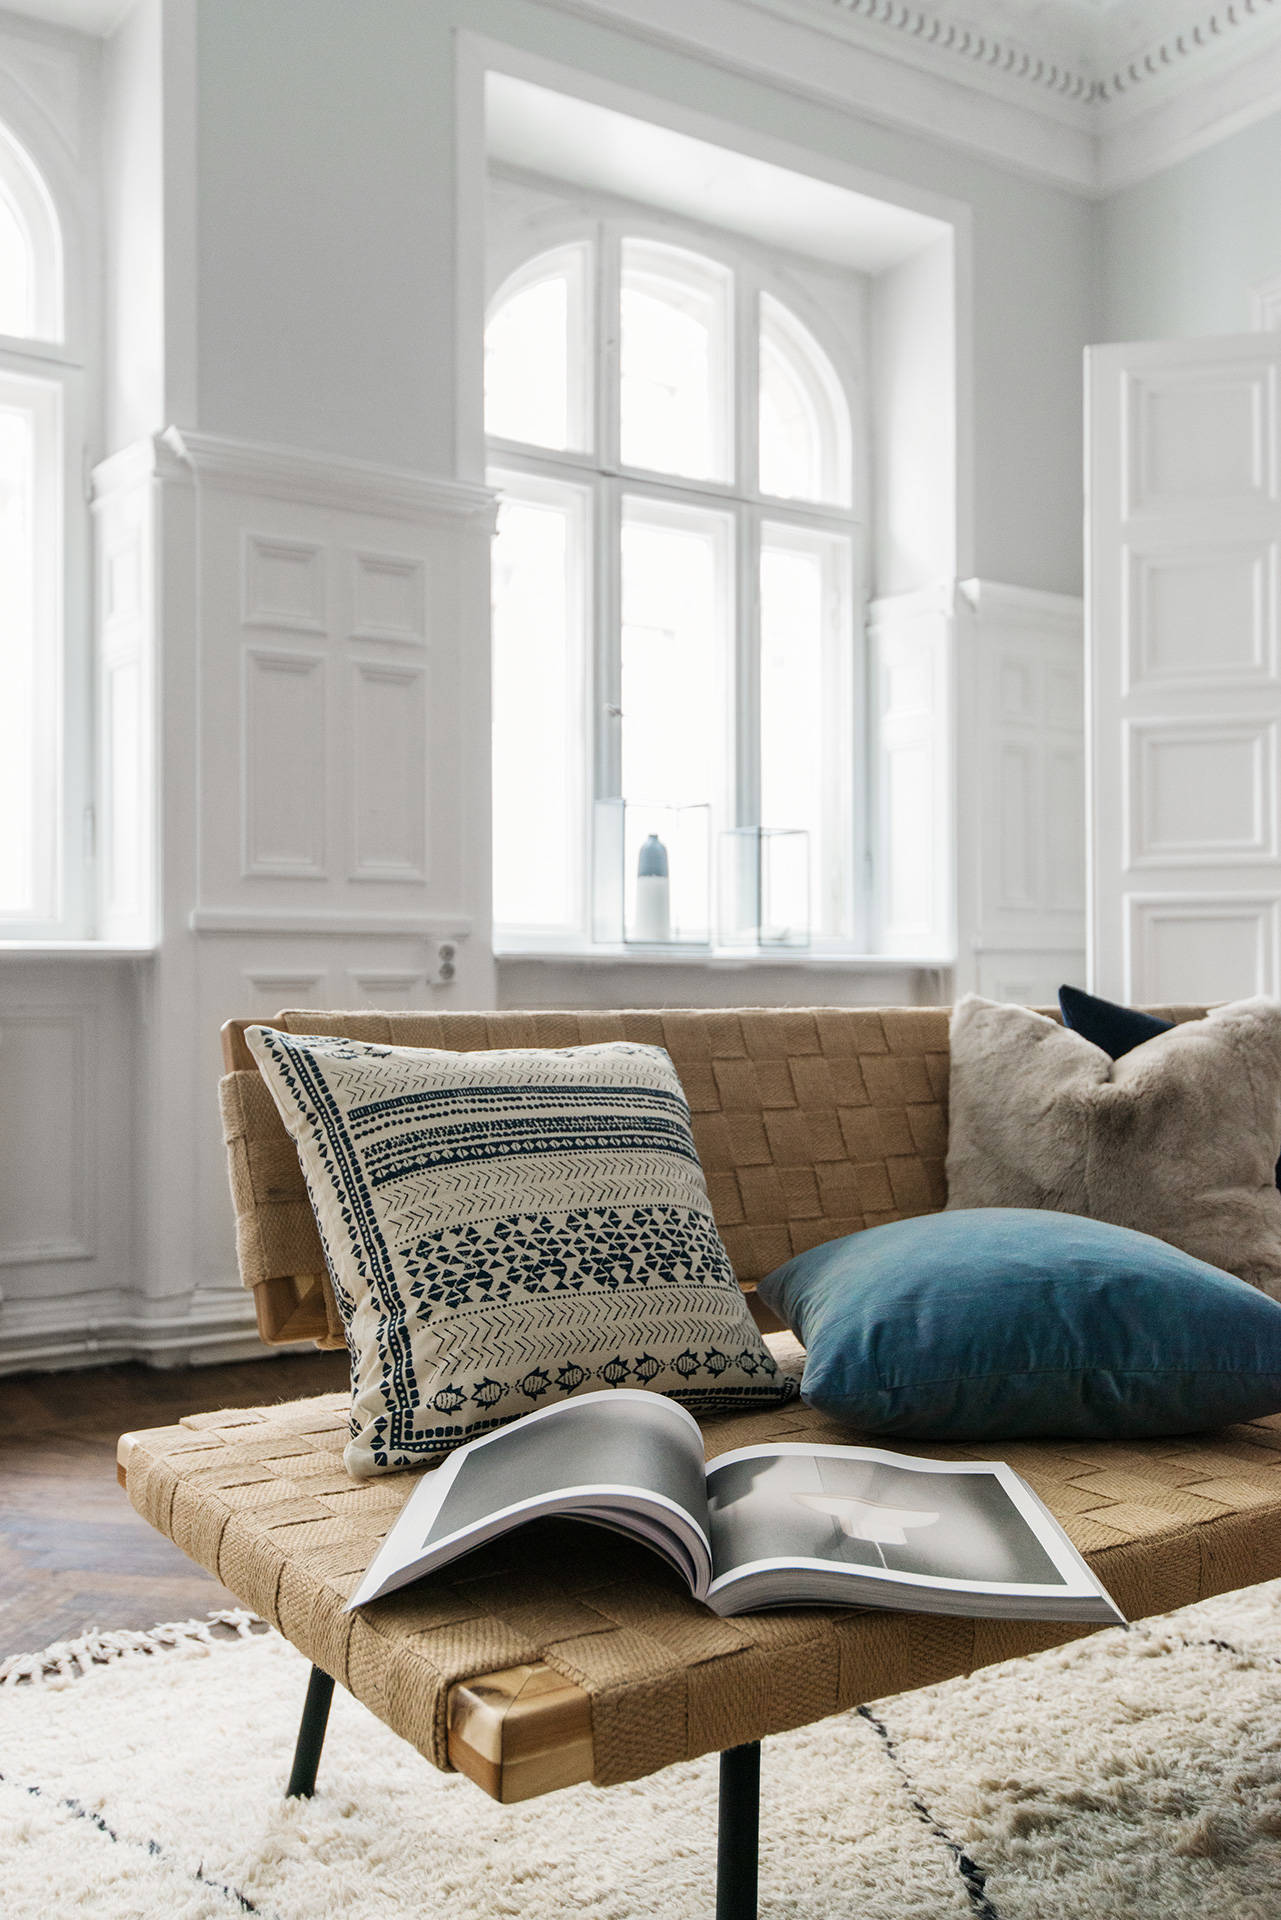 гостиная окна лепнина стеновые панели подоконник